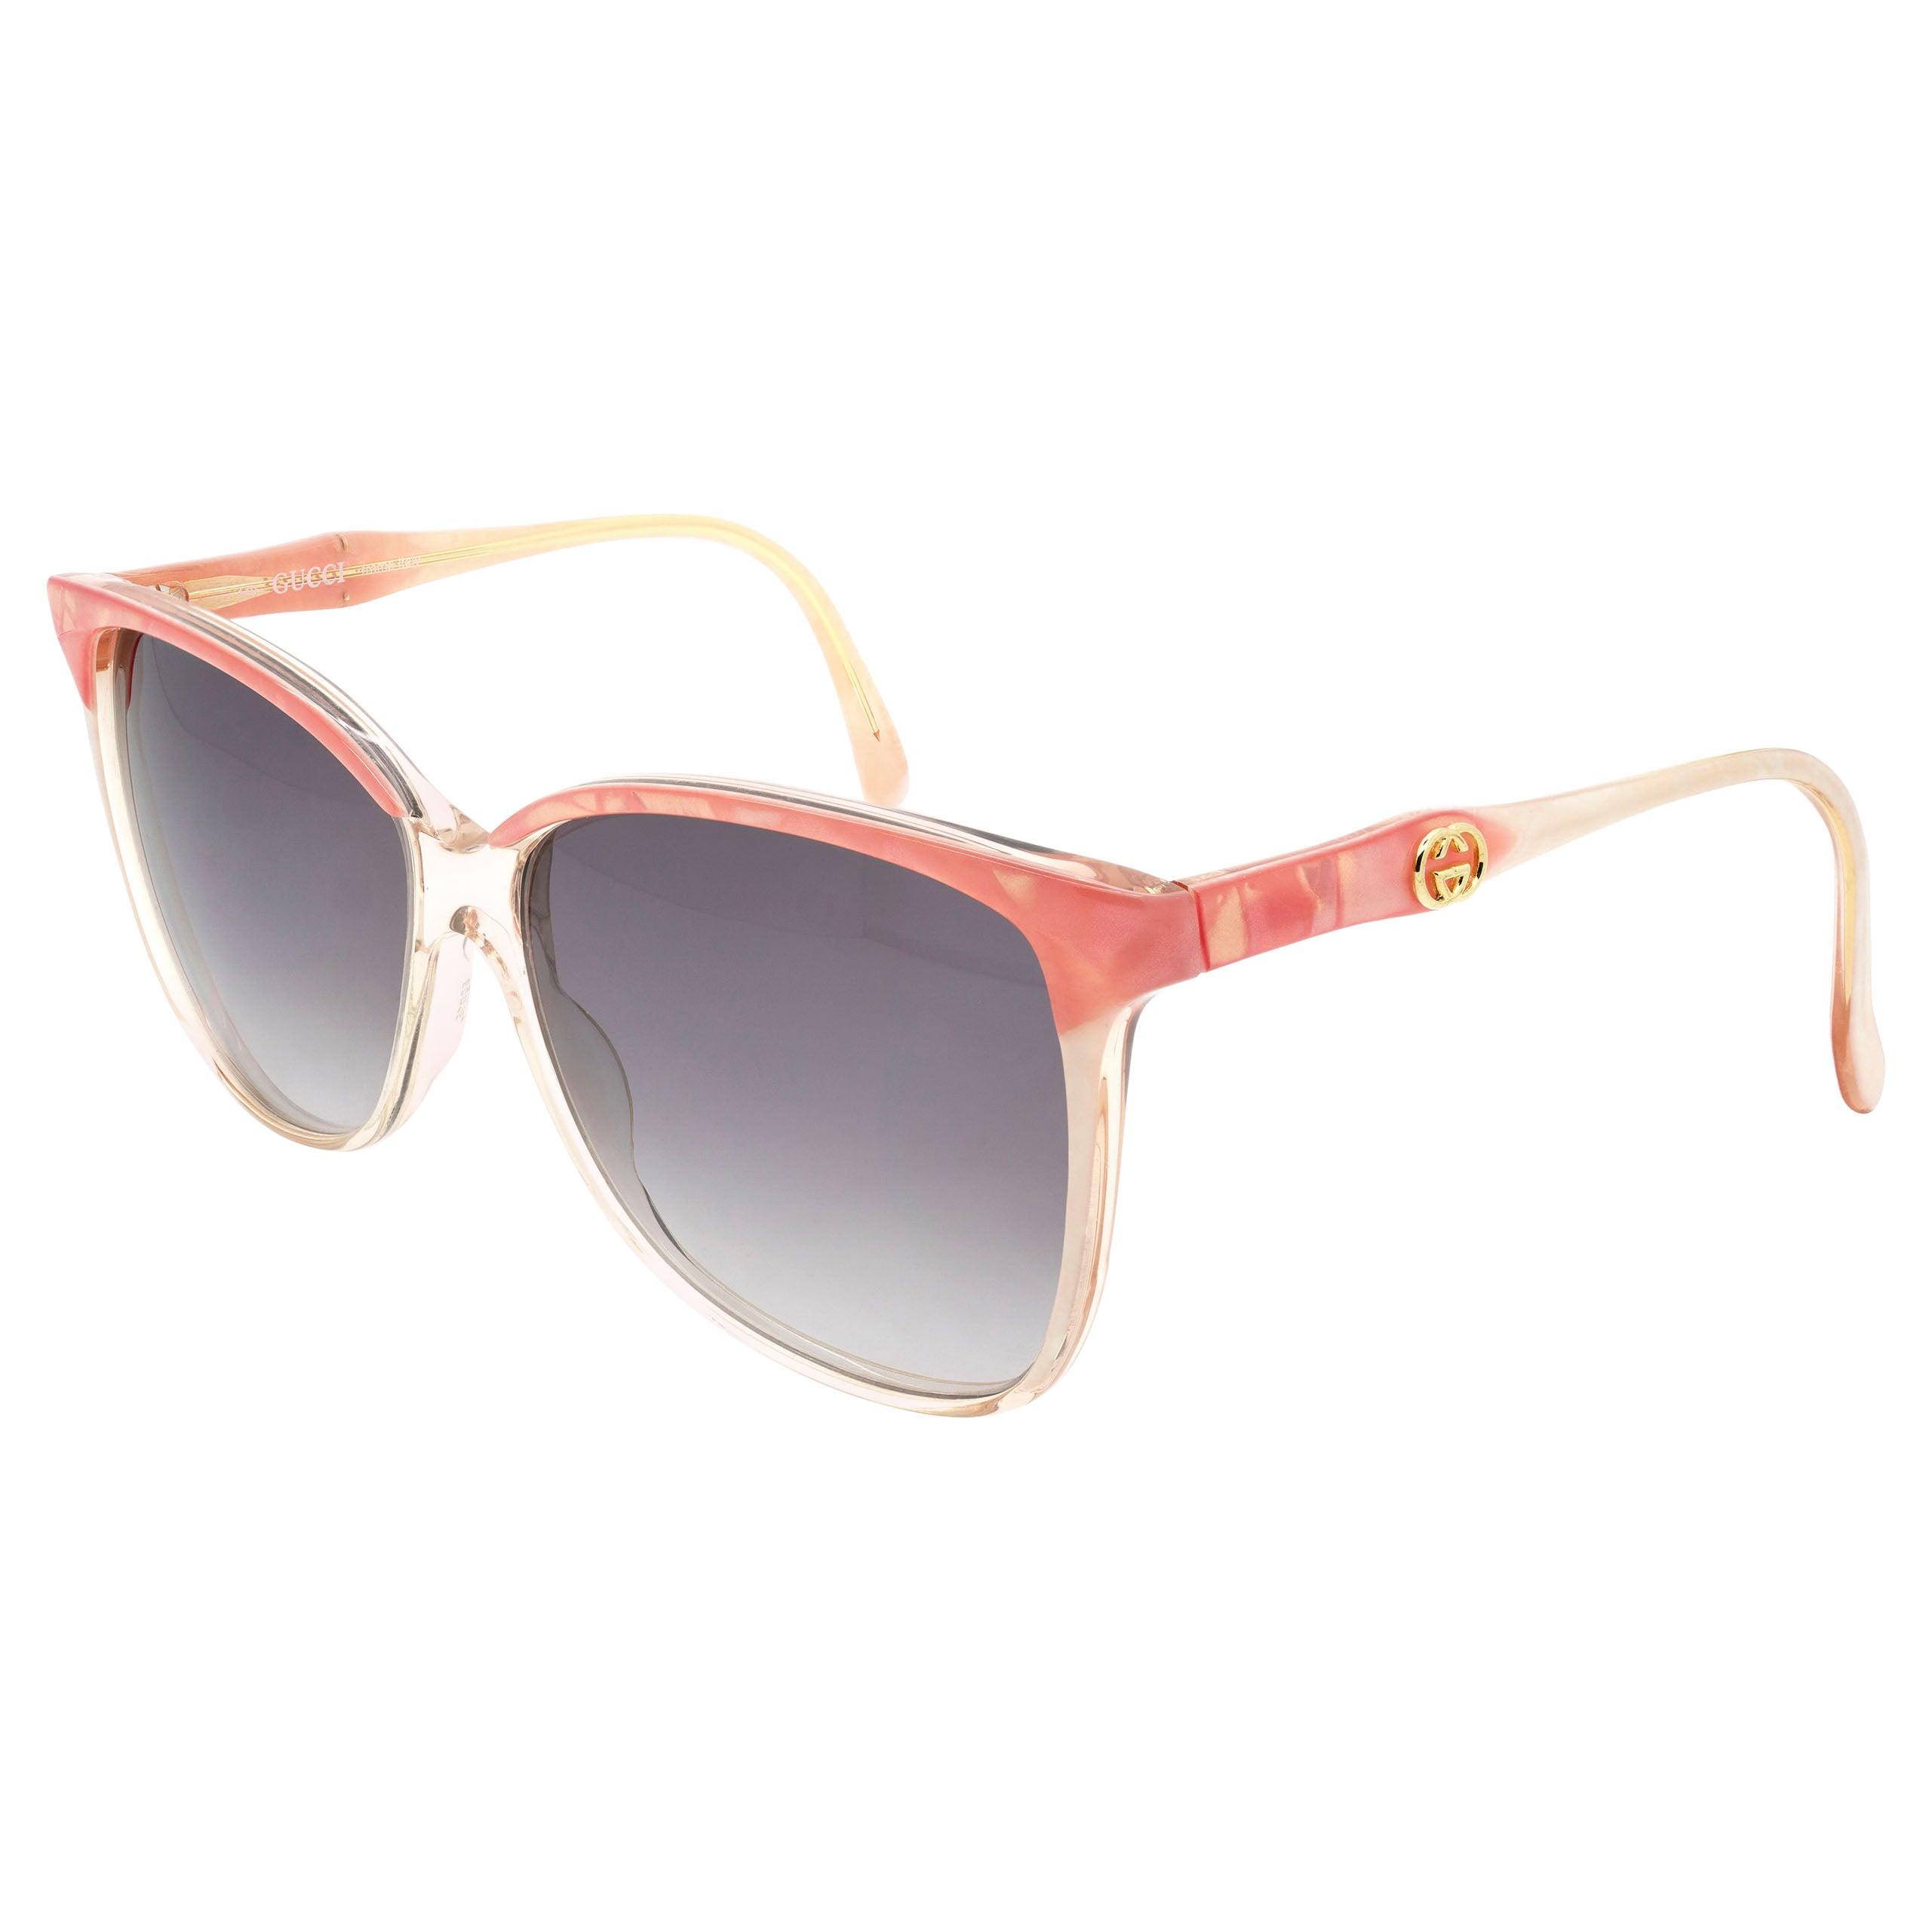 Gucci vintage sunglasses